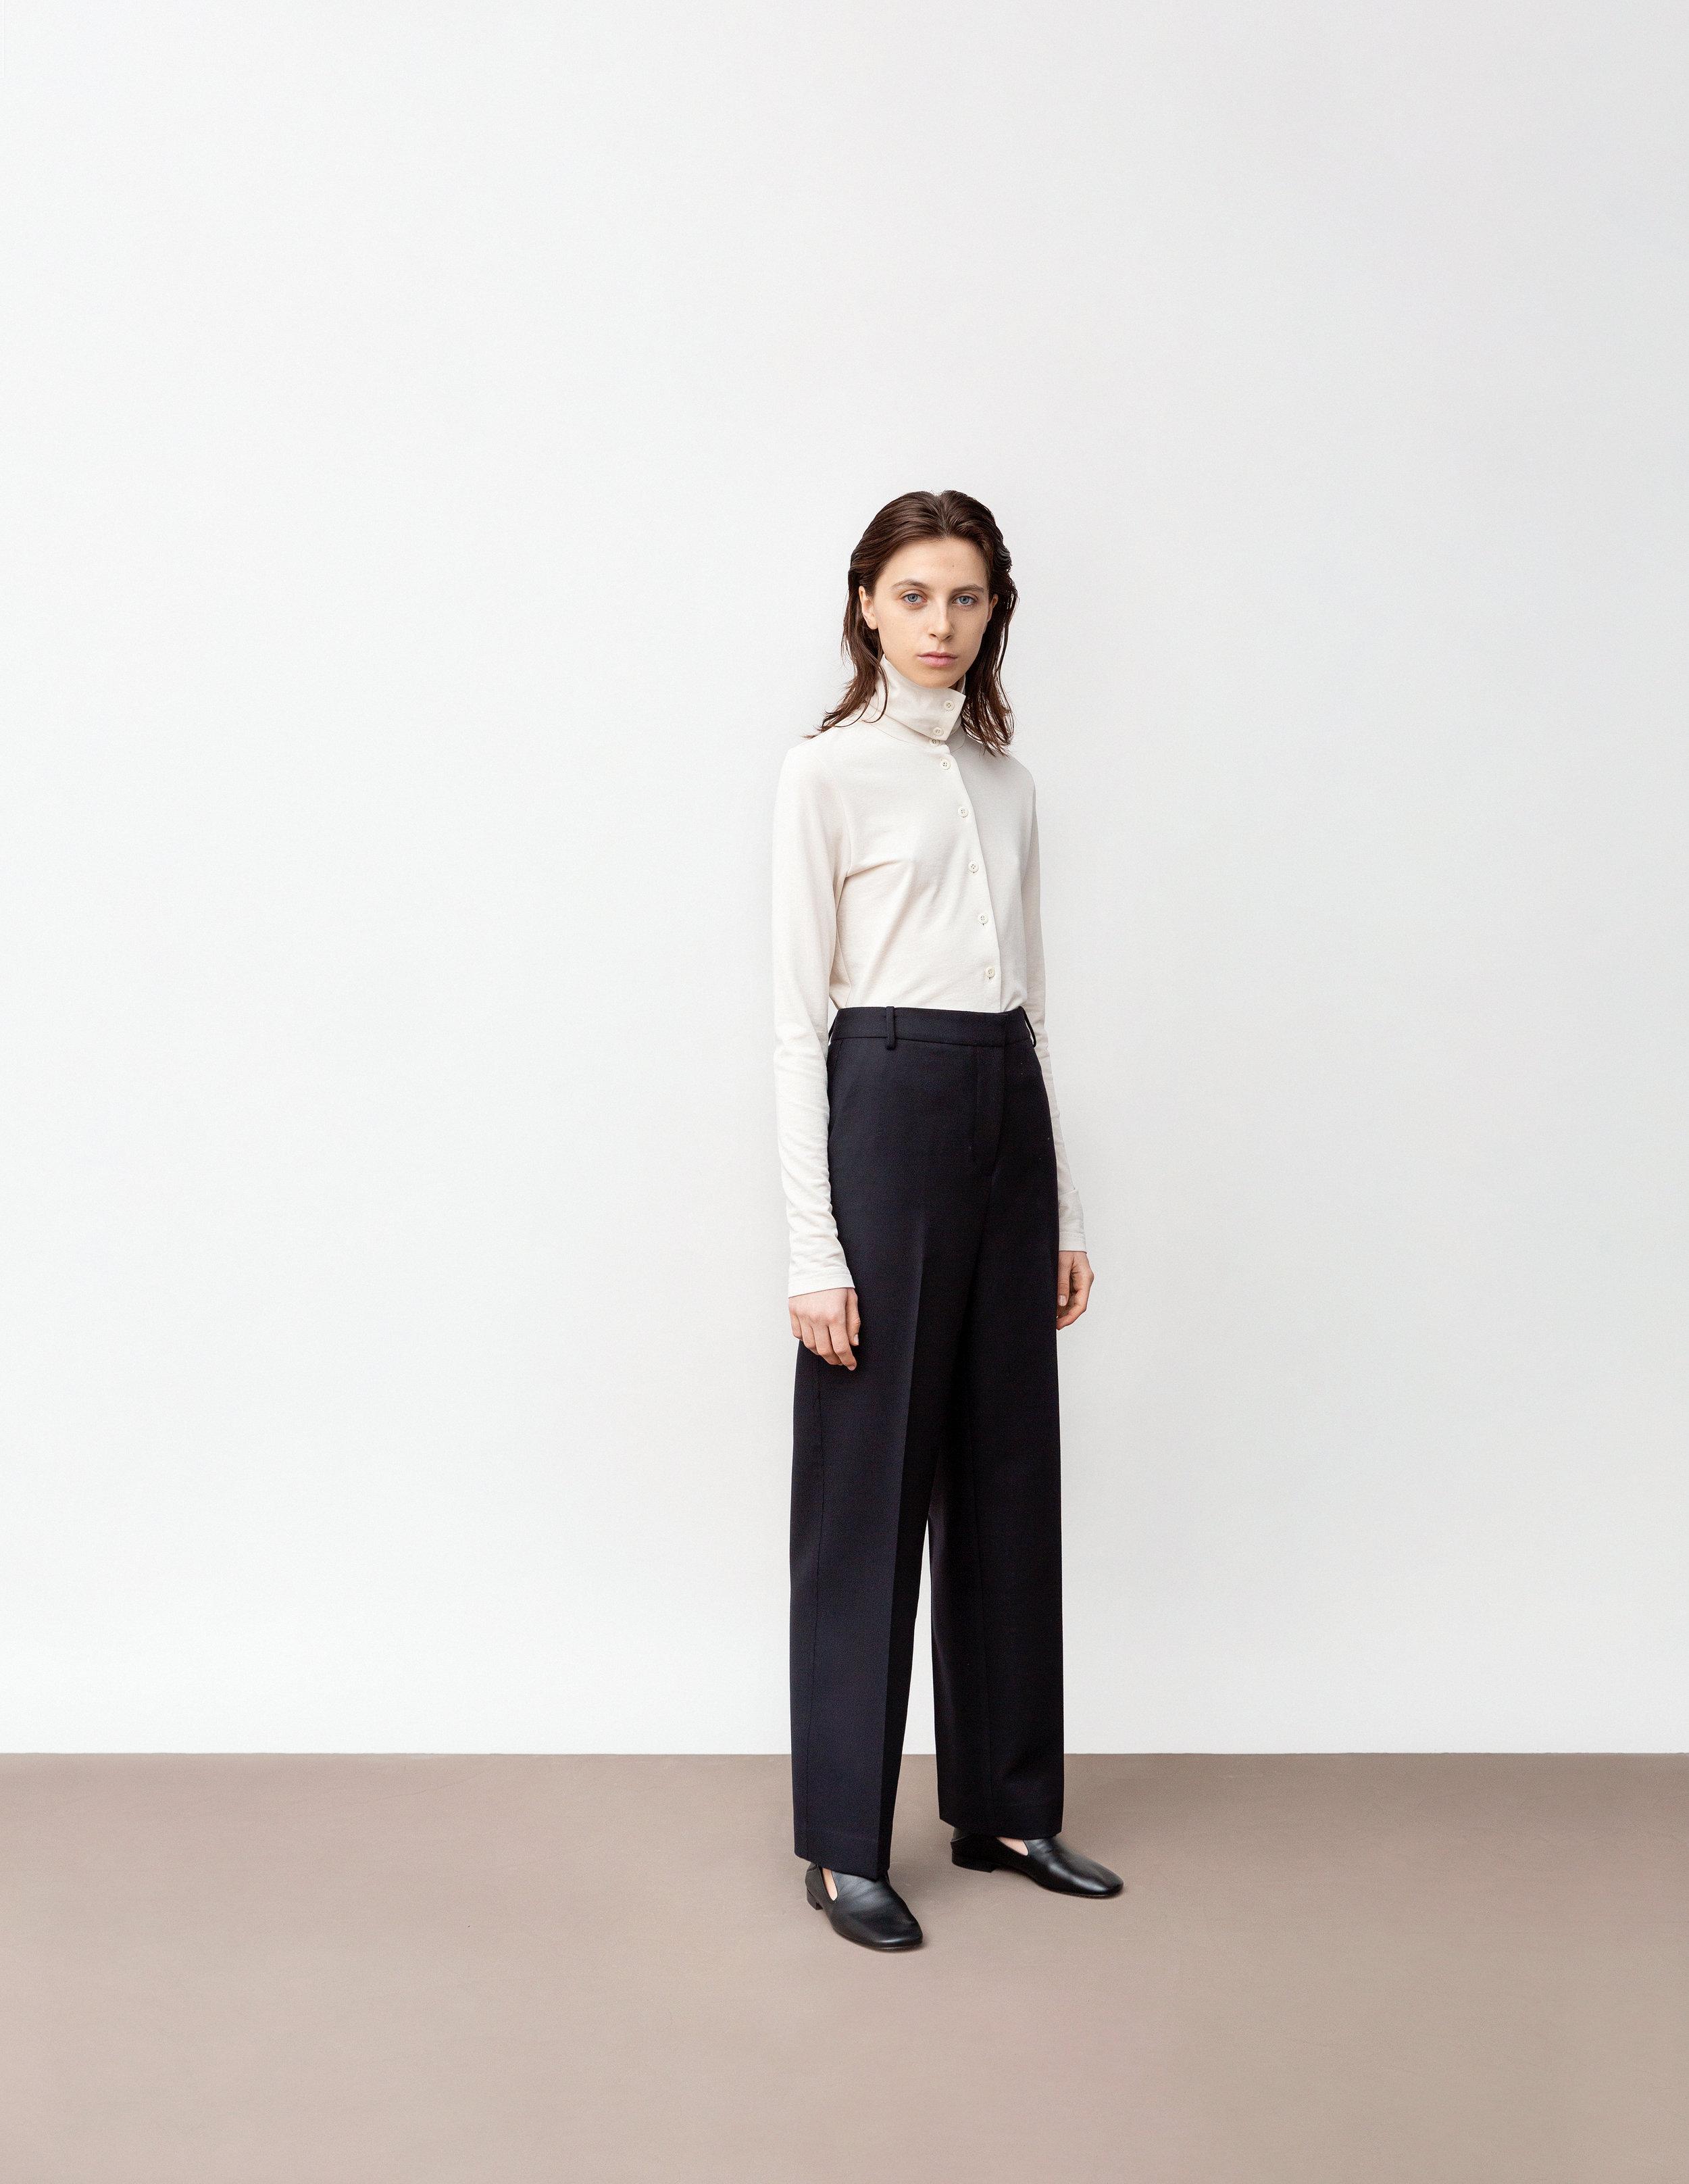 <b>2</b><br>Yvonne dry jersey top<br>Scarlett compact wool pants